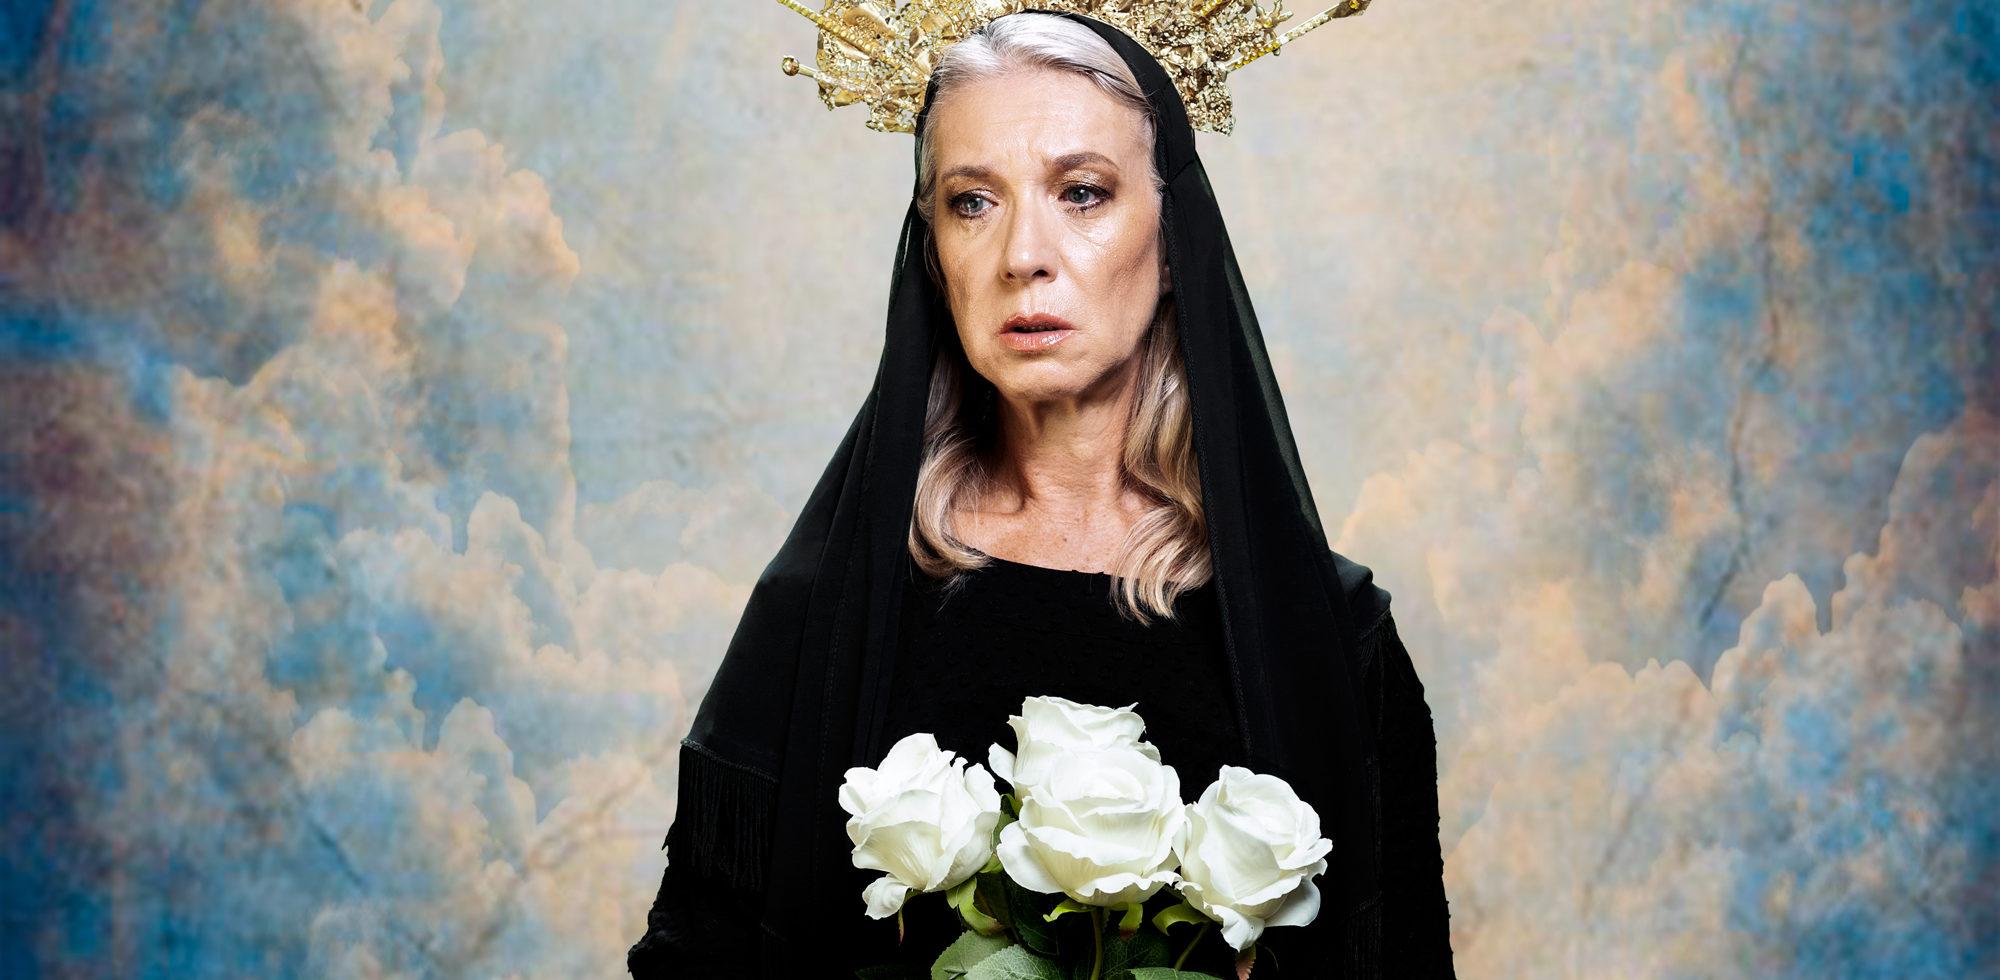 Teatro 'Maria, a Mãe', Custódia Gallego, Elmano Sancho, João Gaspar, Lucília Raimundo